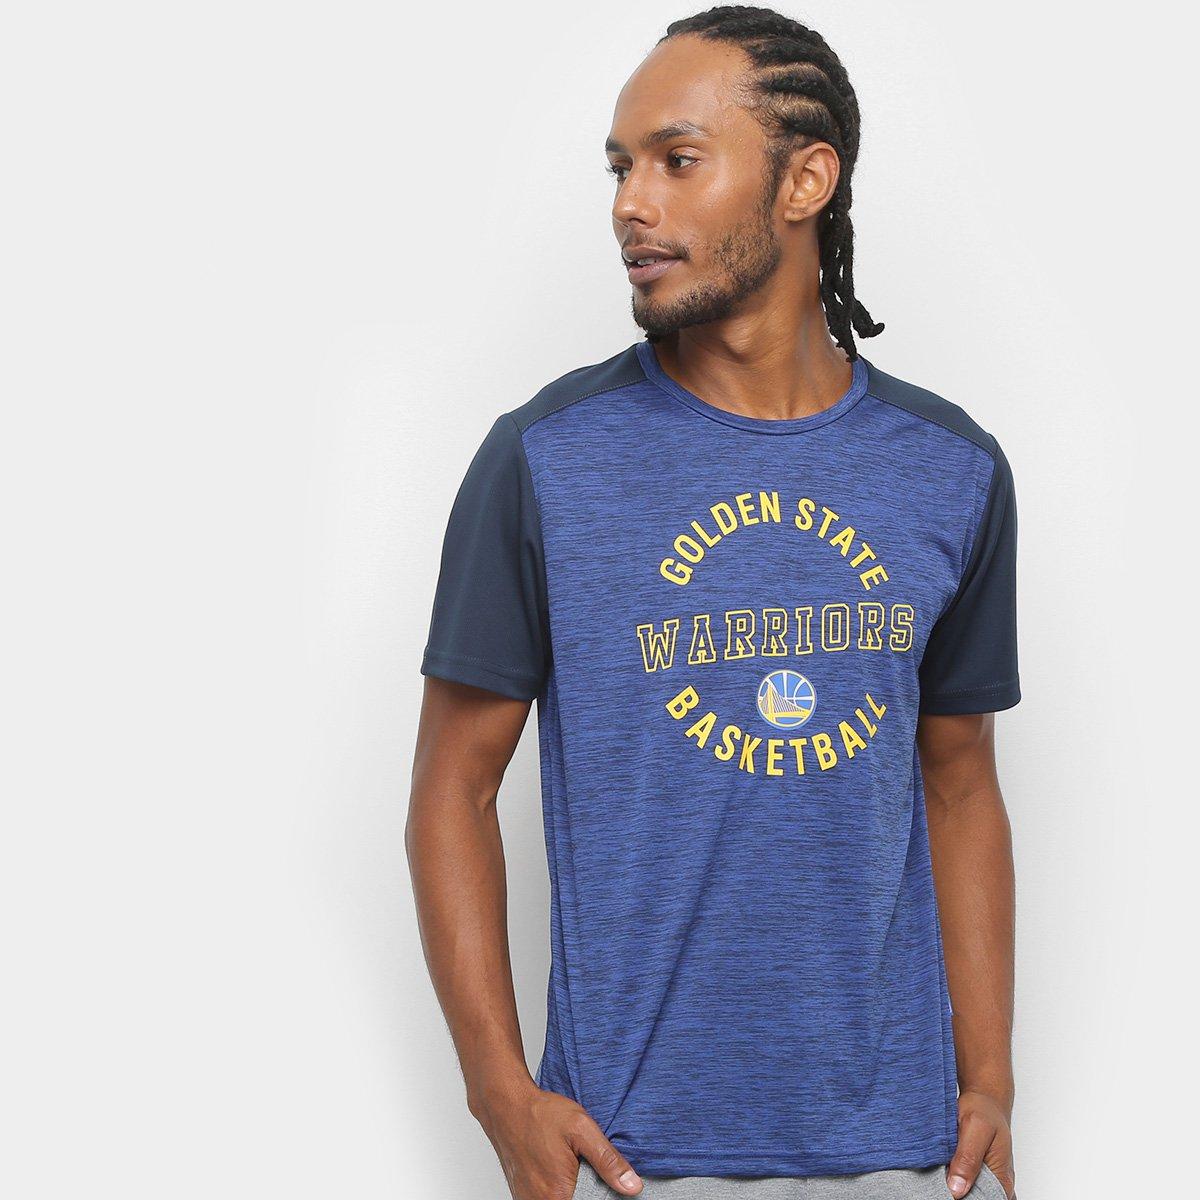 Camiseta NBA Warriors Fio Tinto Mesh 17 Masculina - Marinho e Cinza ... 7f232bce7532c